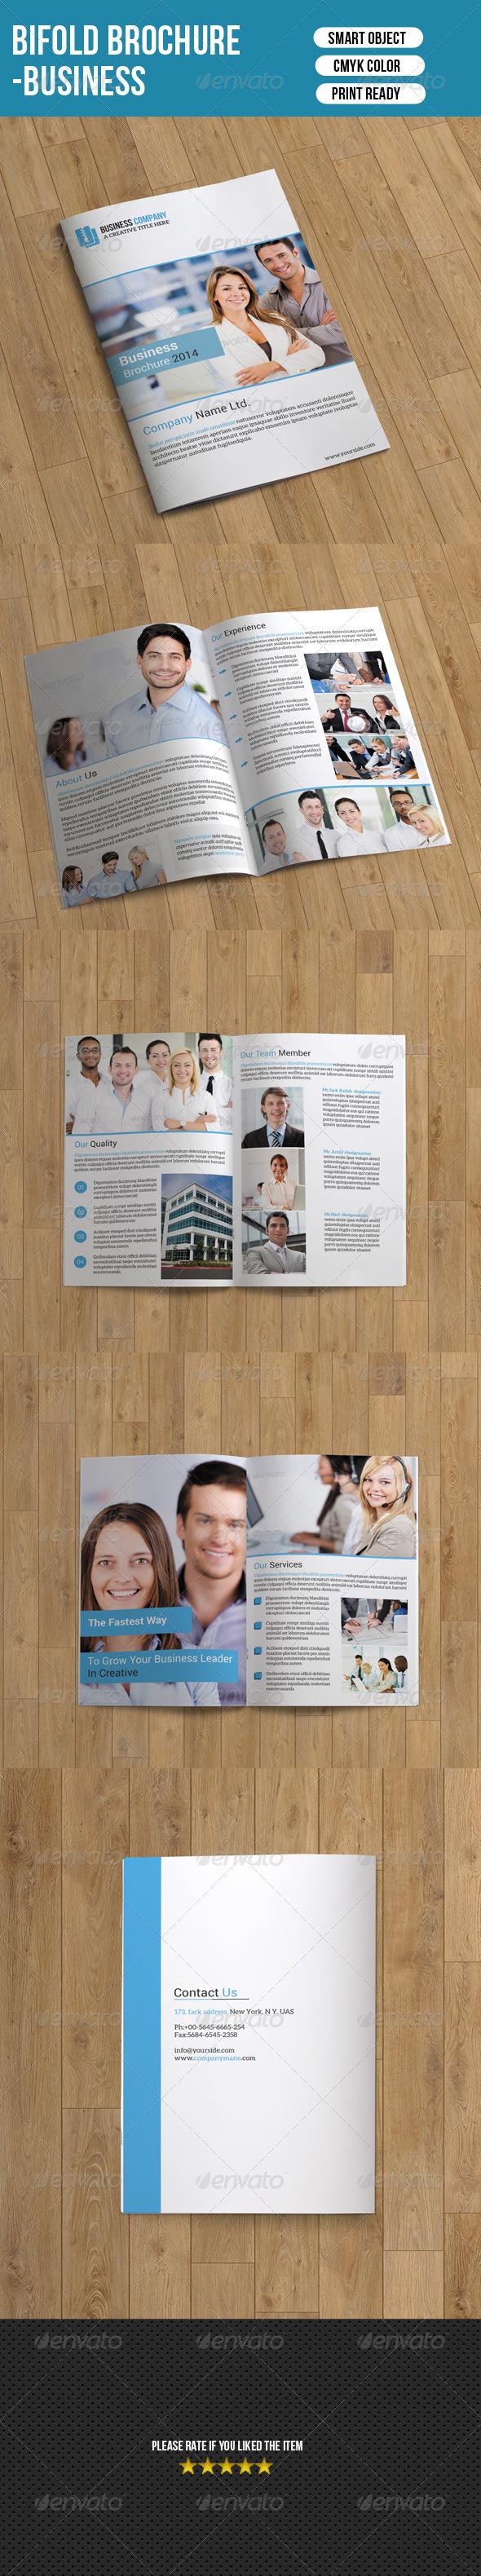 Business Brochure Template